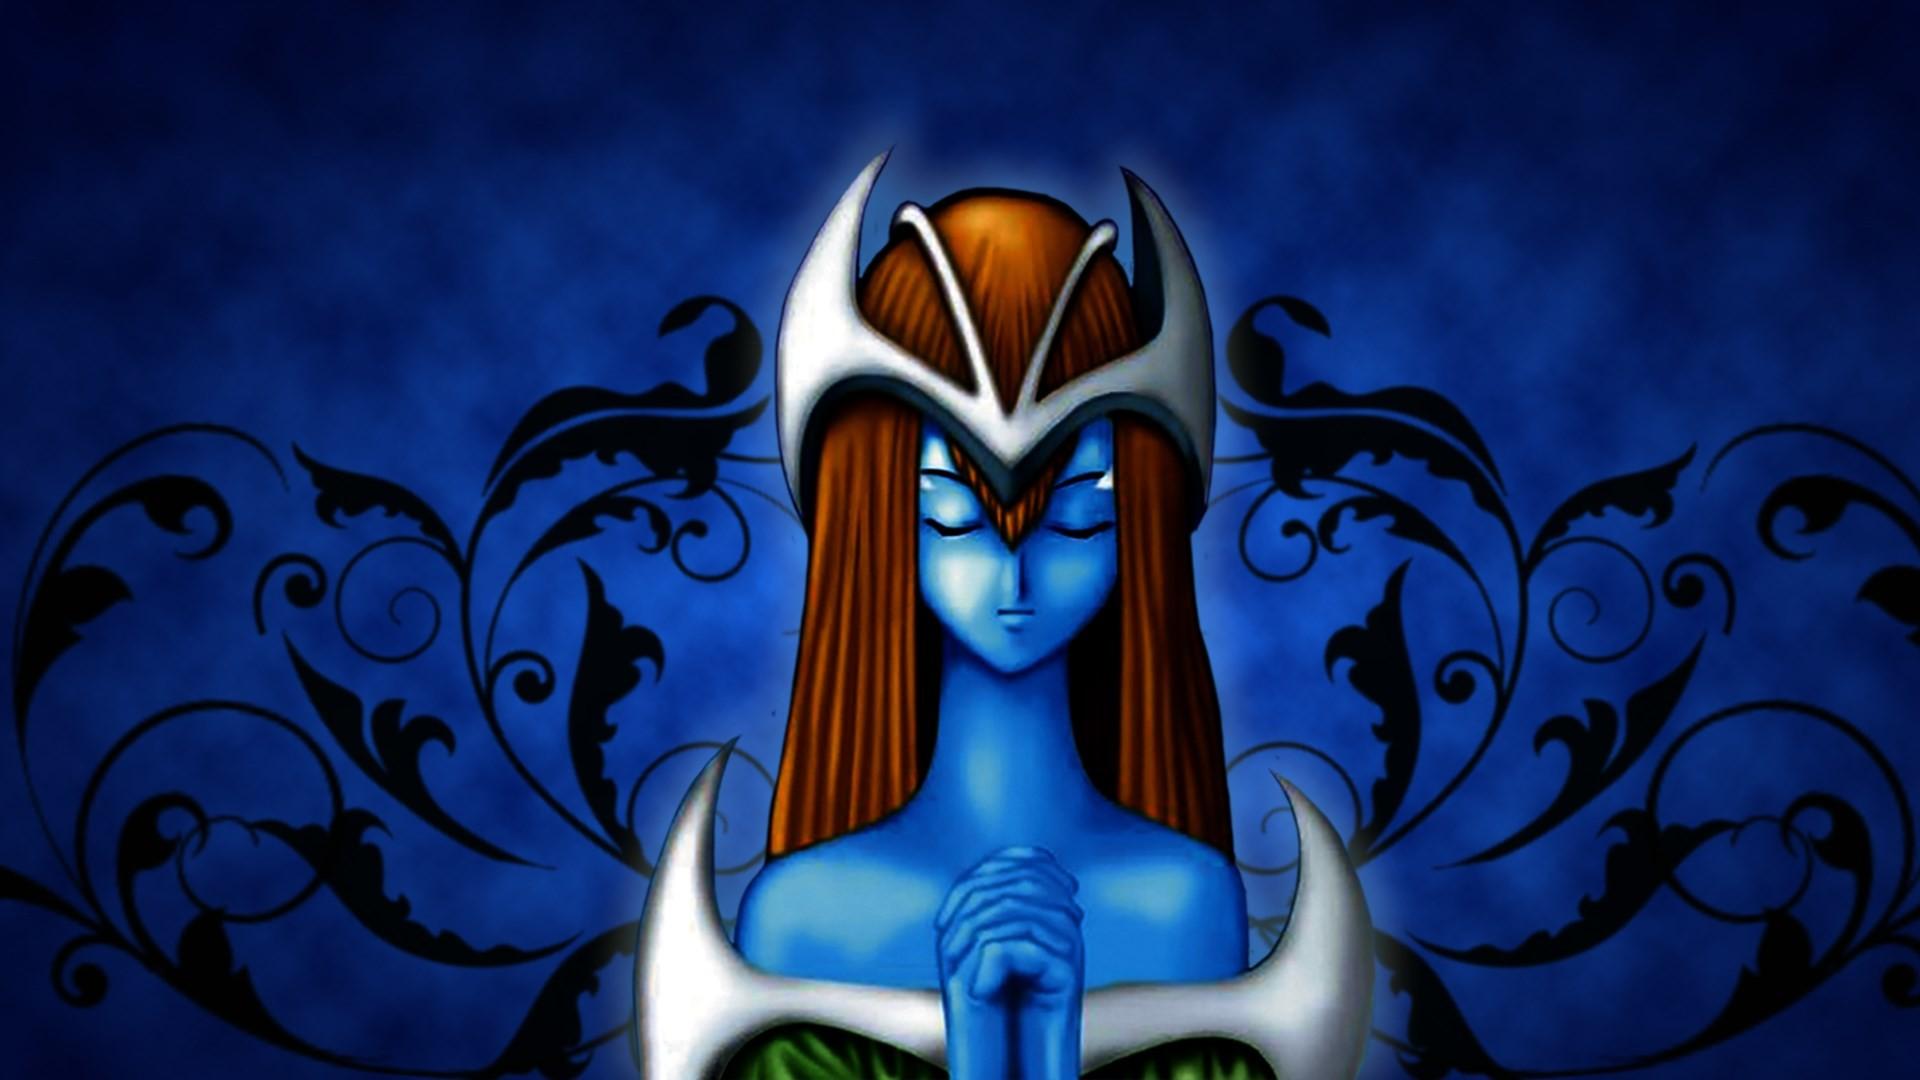 Mystical Elf – Yu-Gi-Oh! wallpaper – 1006722